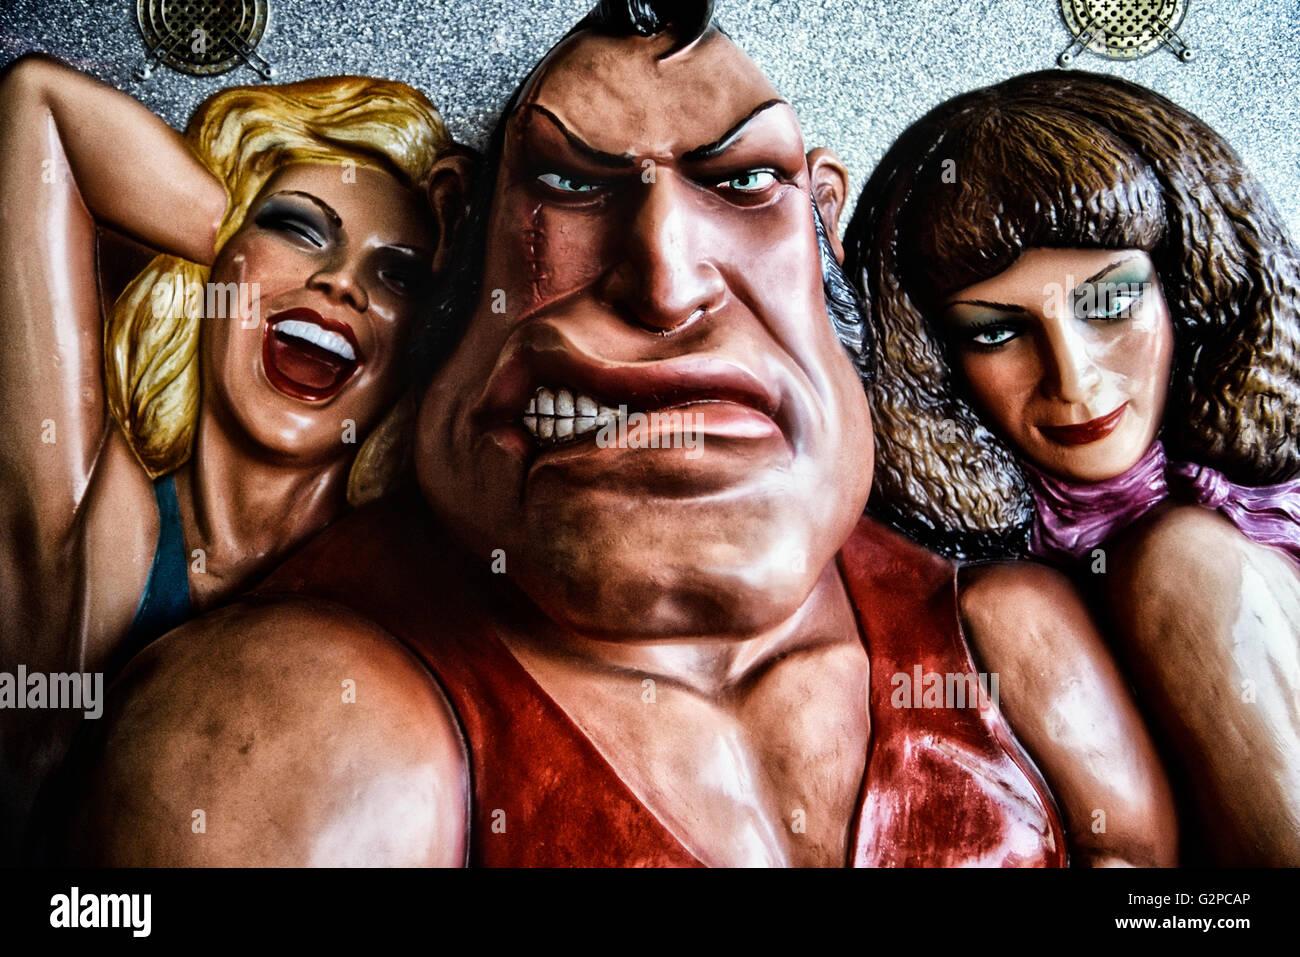 Cartoon figures on an arm wrestling machine - Stock Image